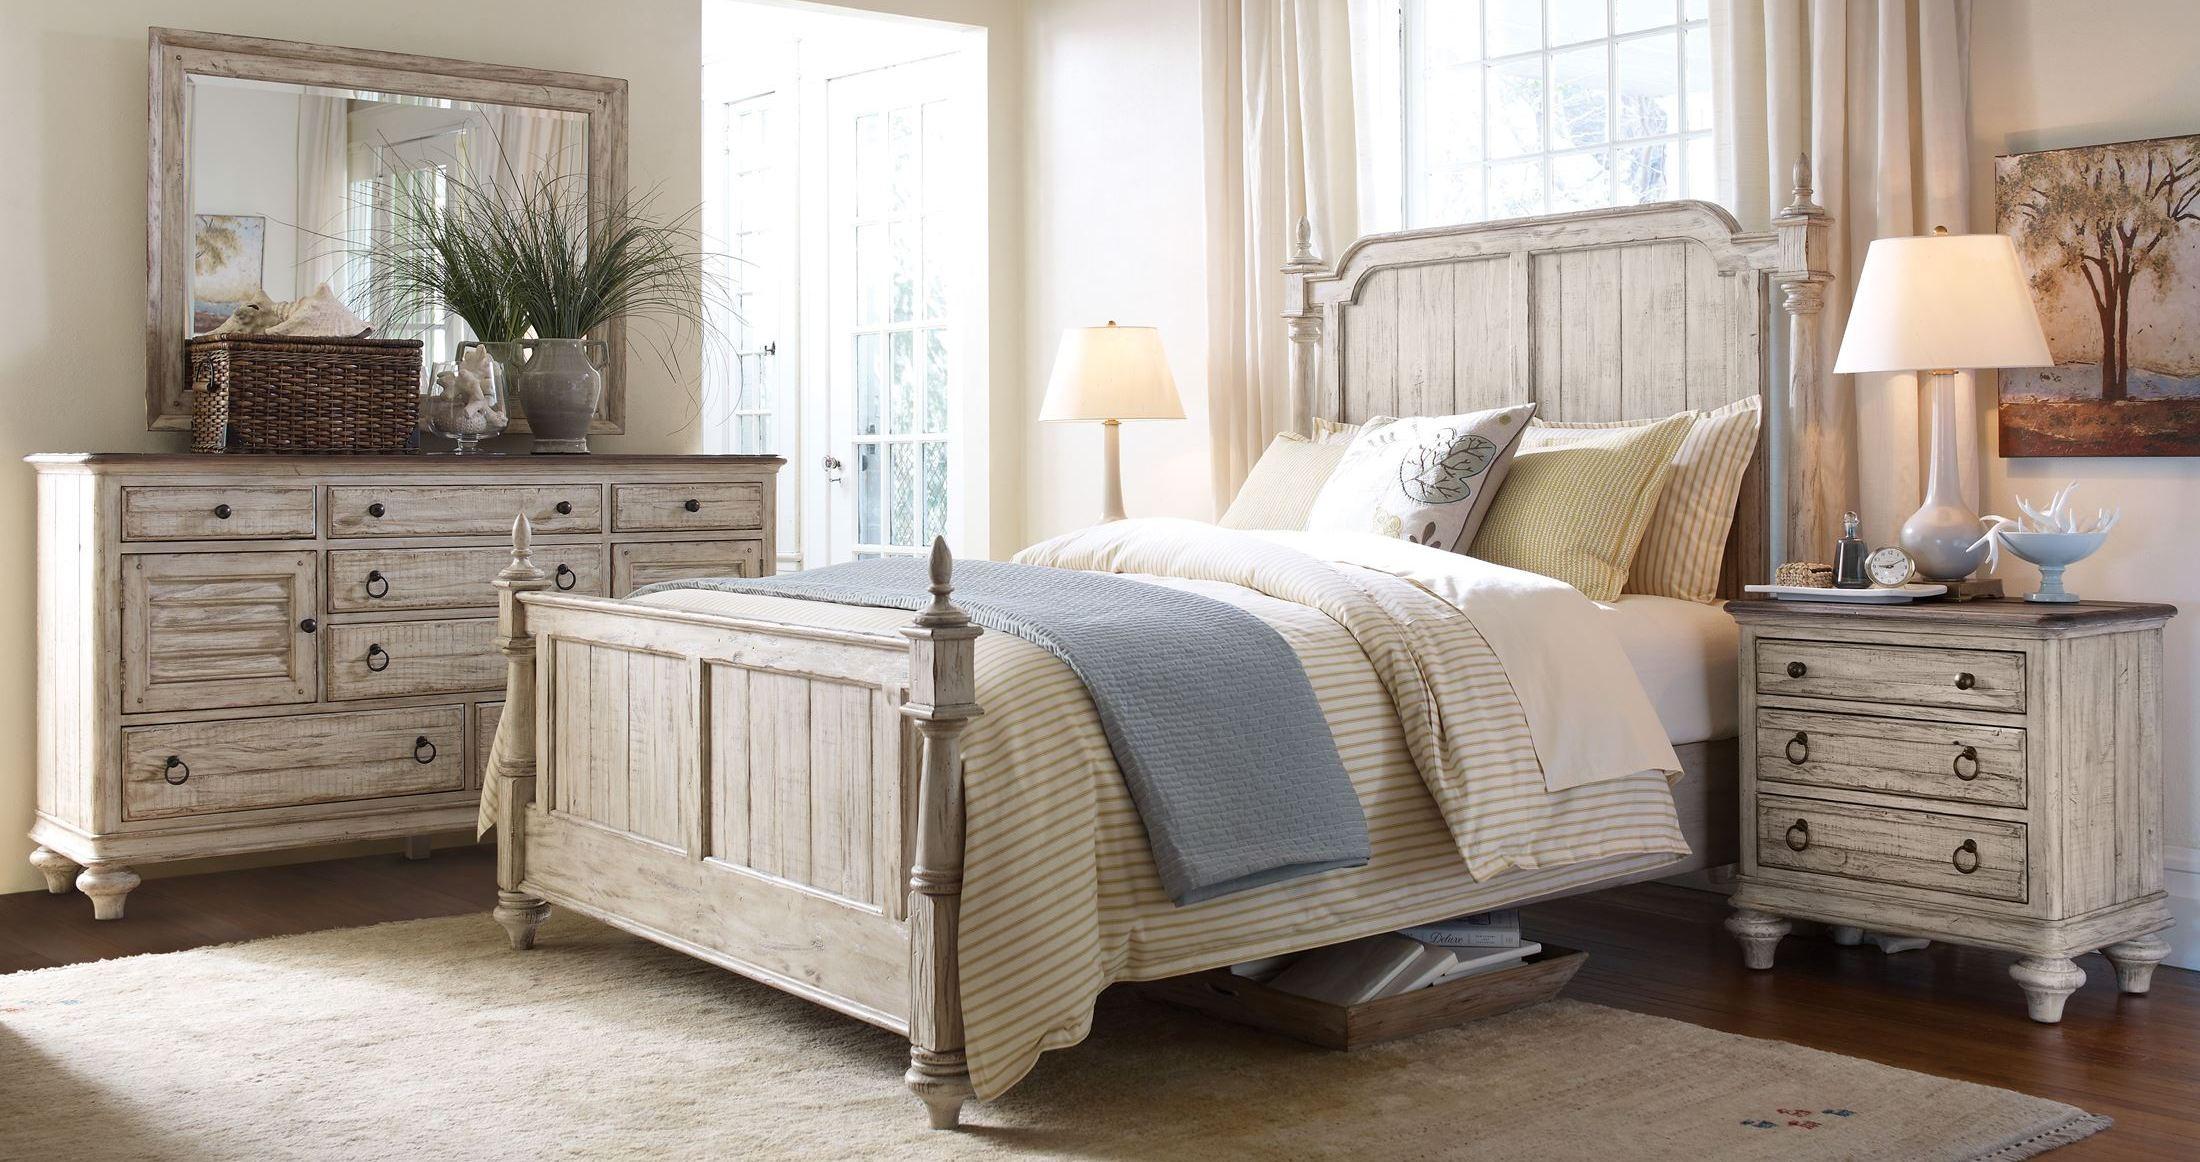 Etonnant Weatherford Cornsilk Westland Bedroom Set From Kincaid (75 135P) | Coleman  Furniture